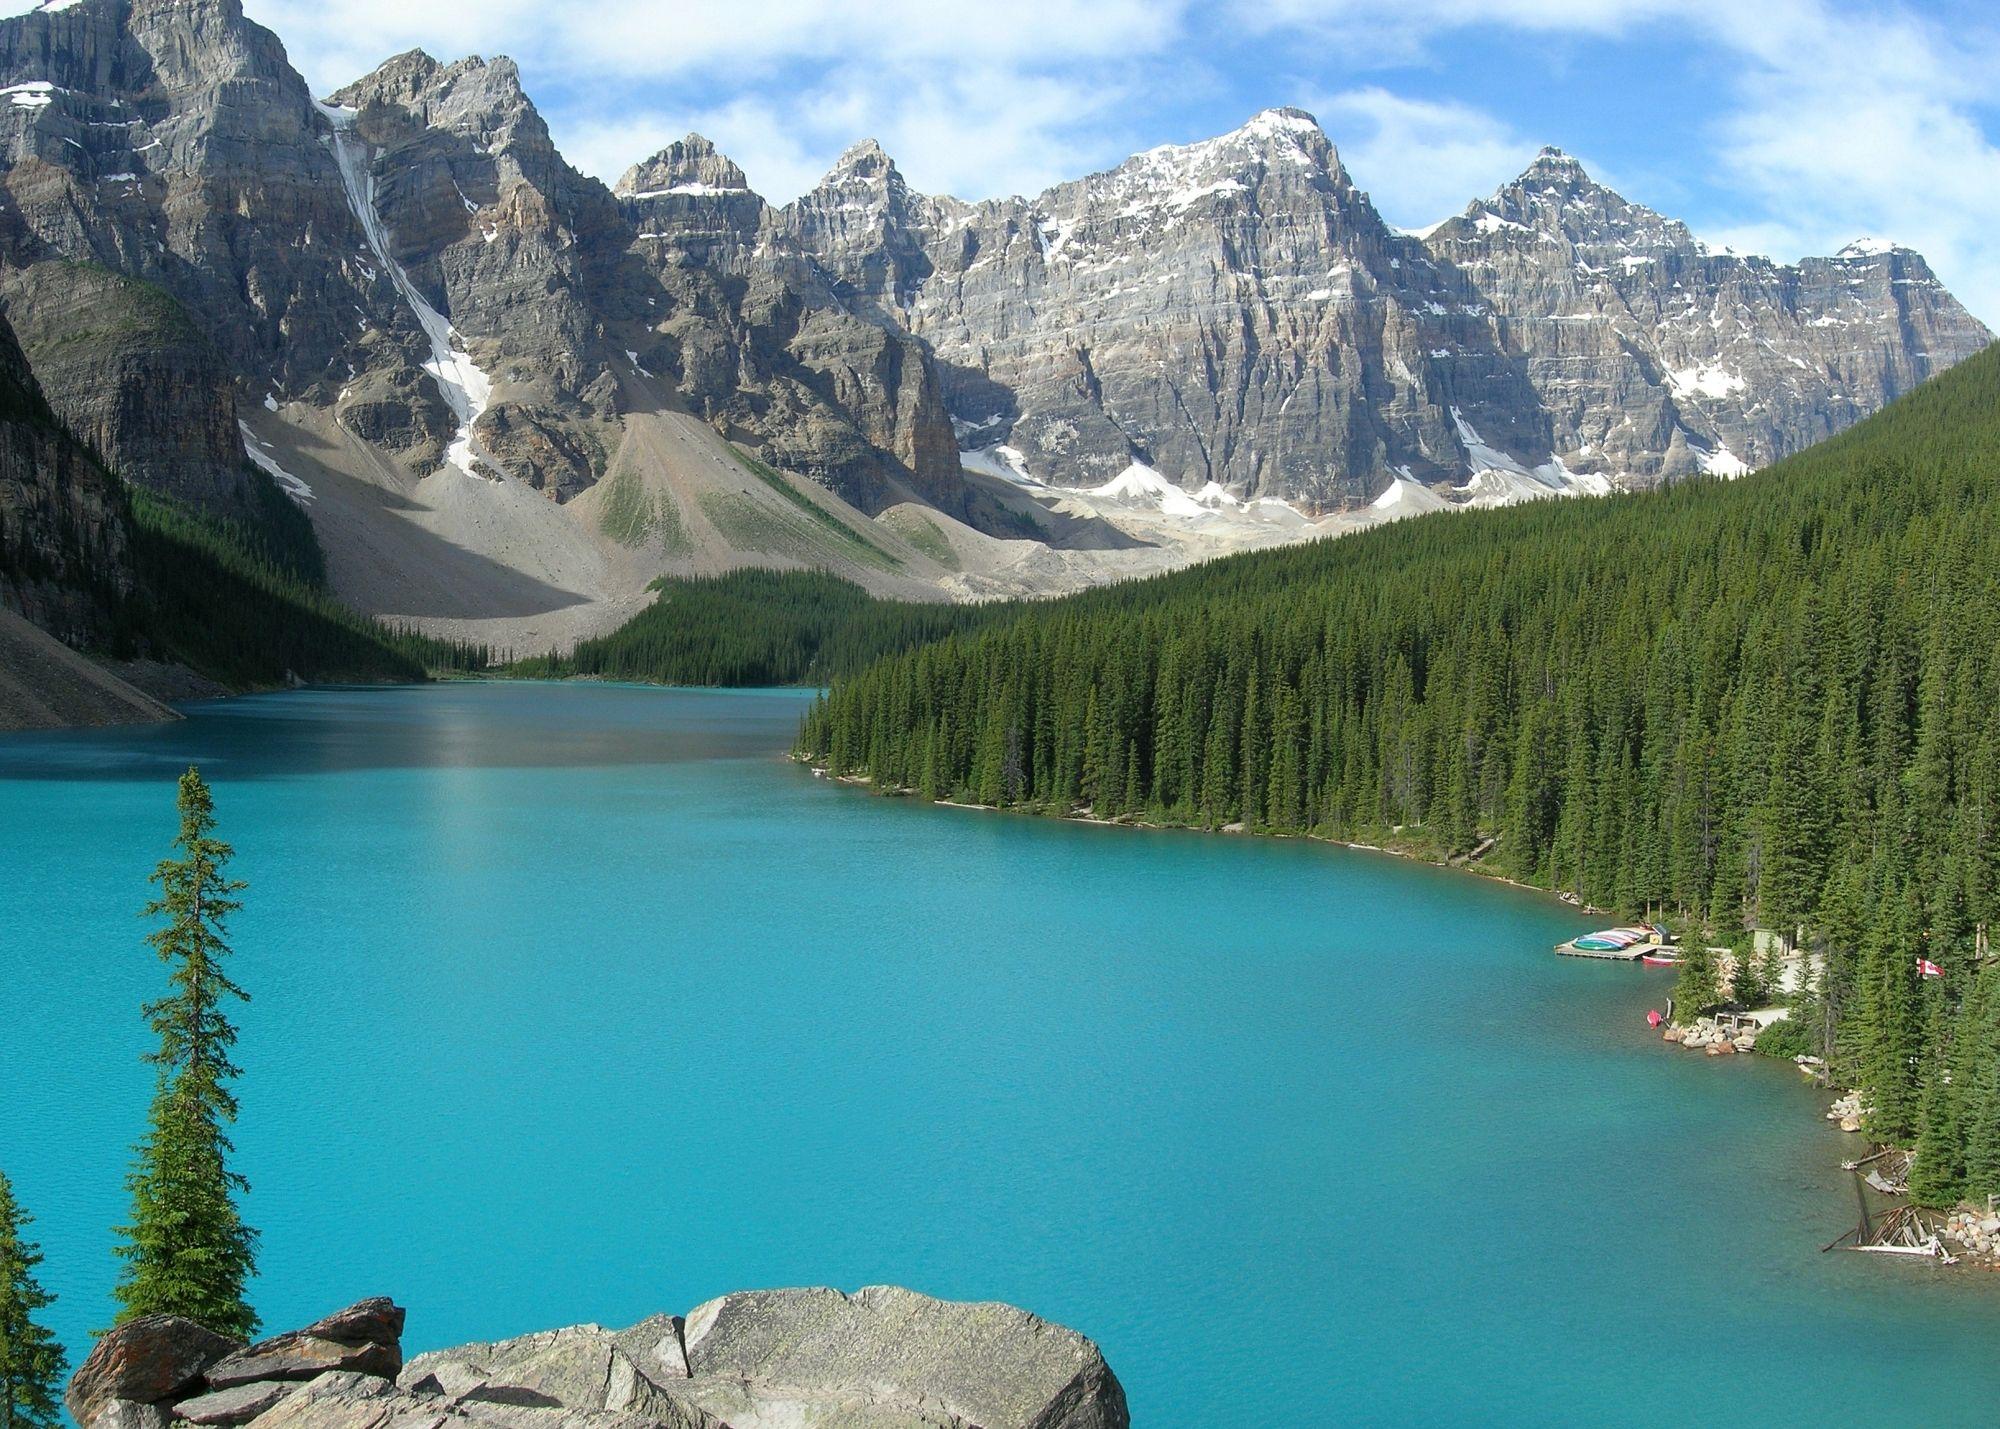 Parque National de Banff